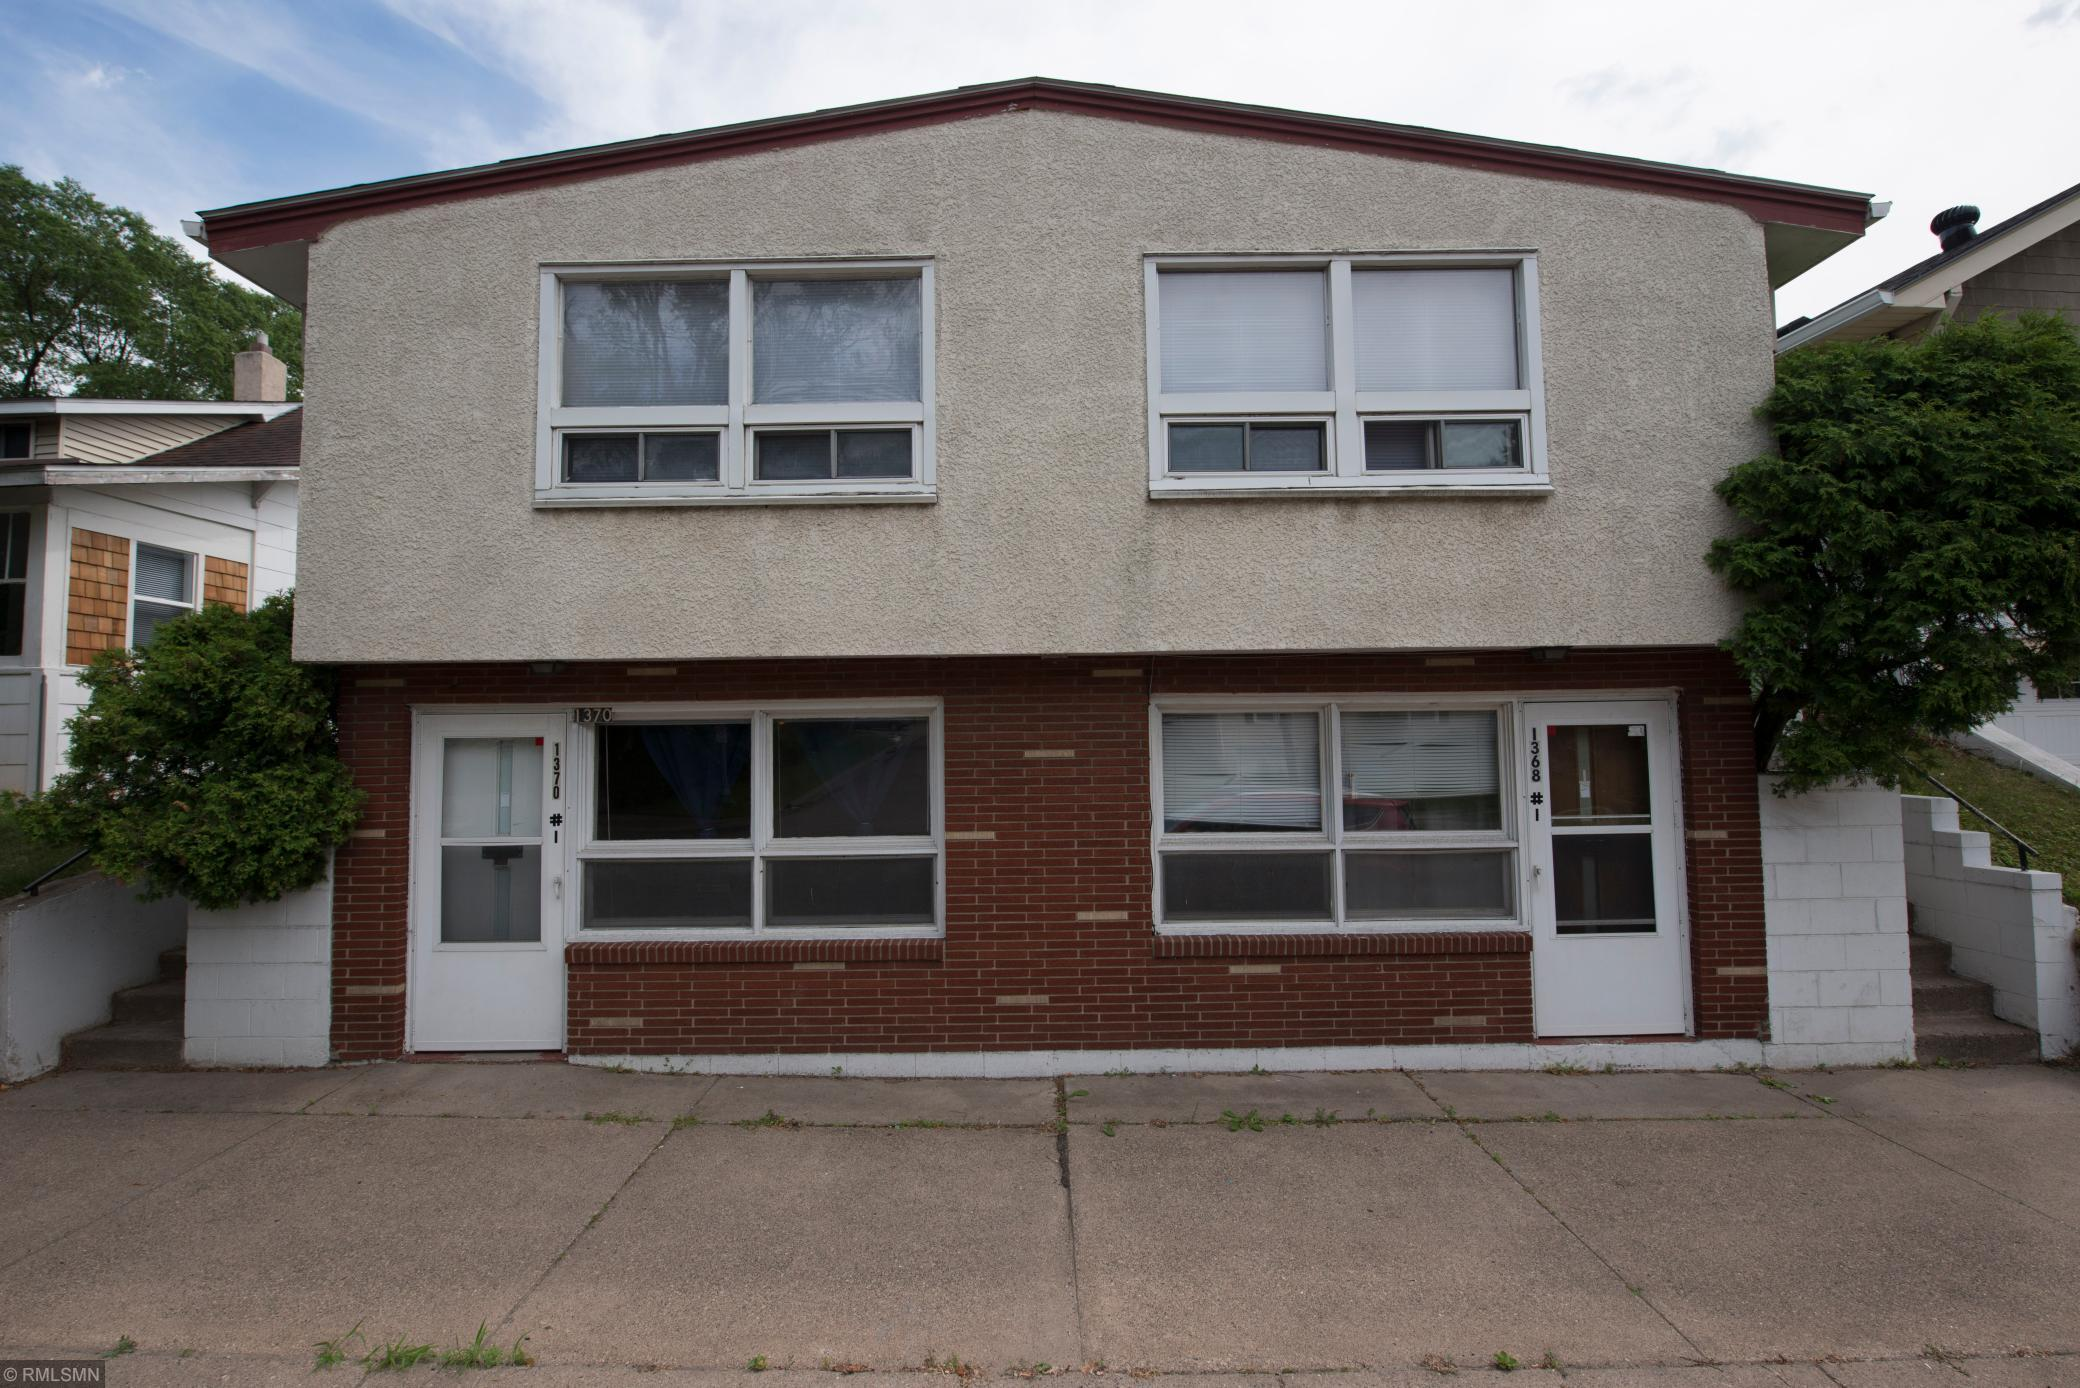 1368-1370 7th E Property Photo - Saint Paul, MN real estate listing